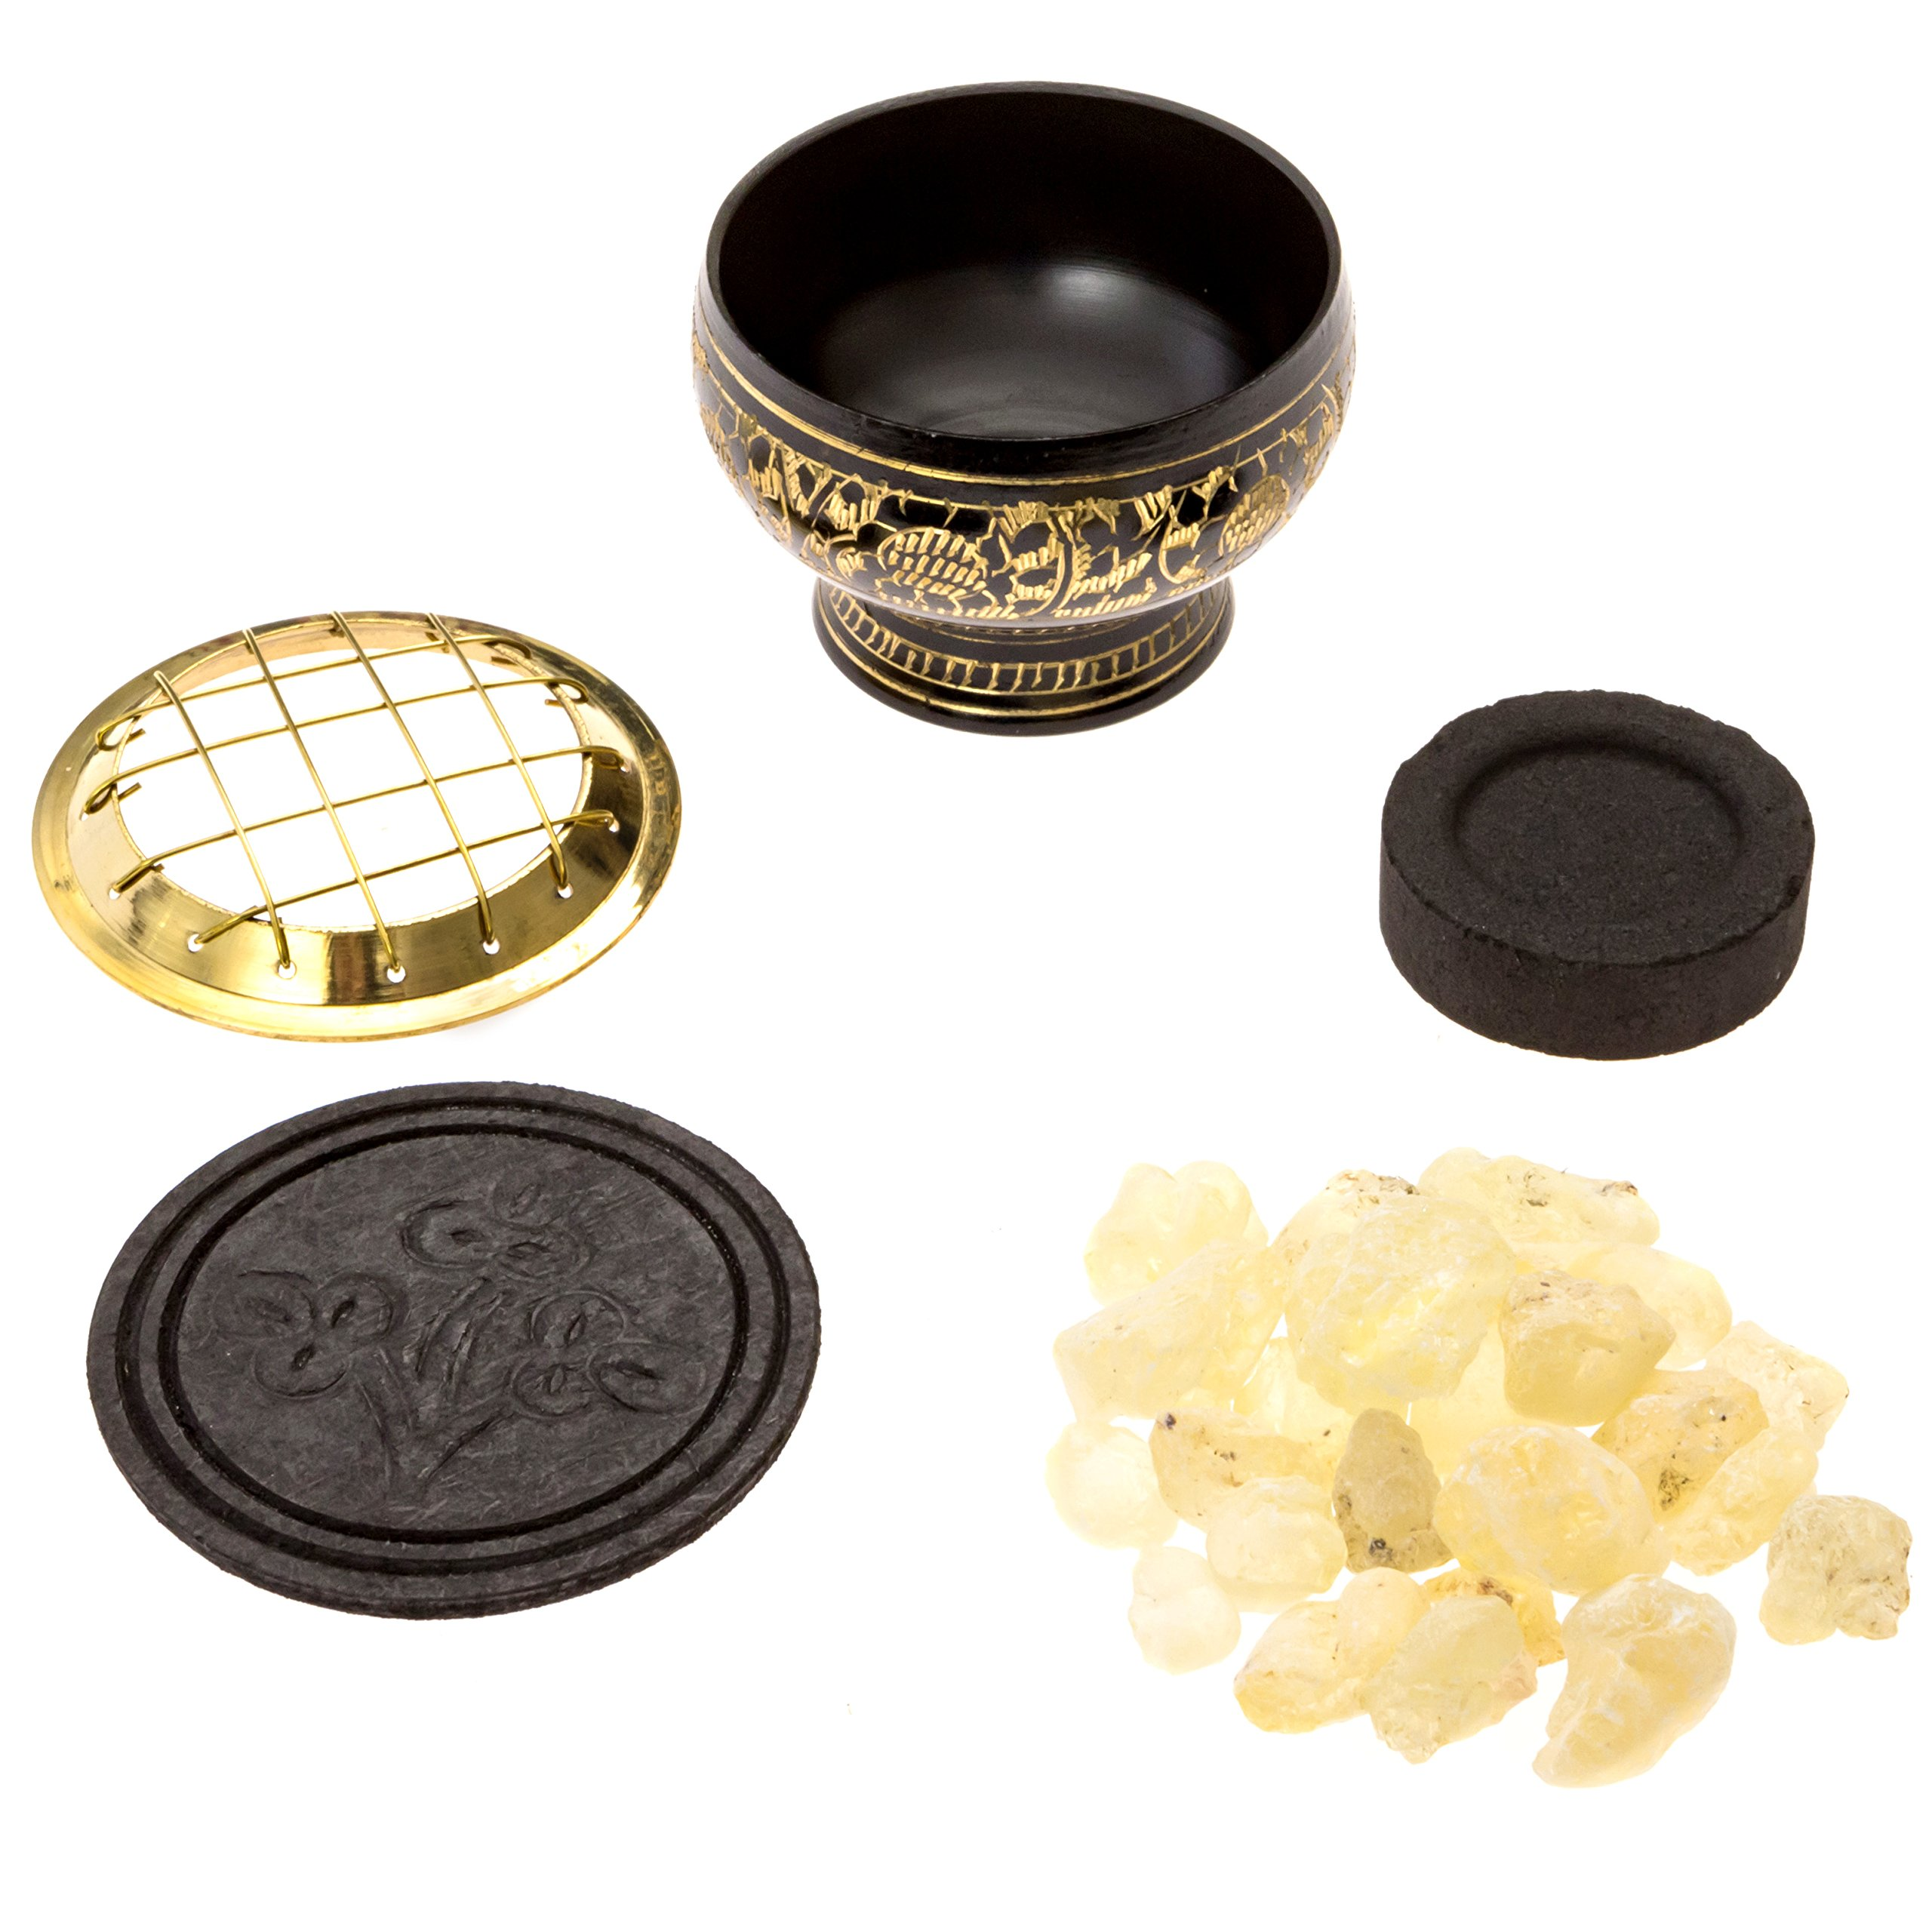 Alternative Imagination Premium Copal Burning Kit (with Tibetan Incense Burner or Brass Screen Burner) (Black Brass) by Alternative Imagination (Image #3)